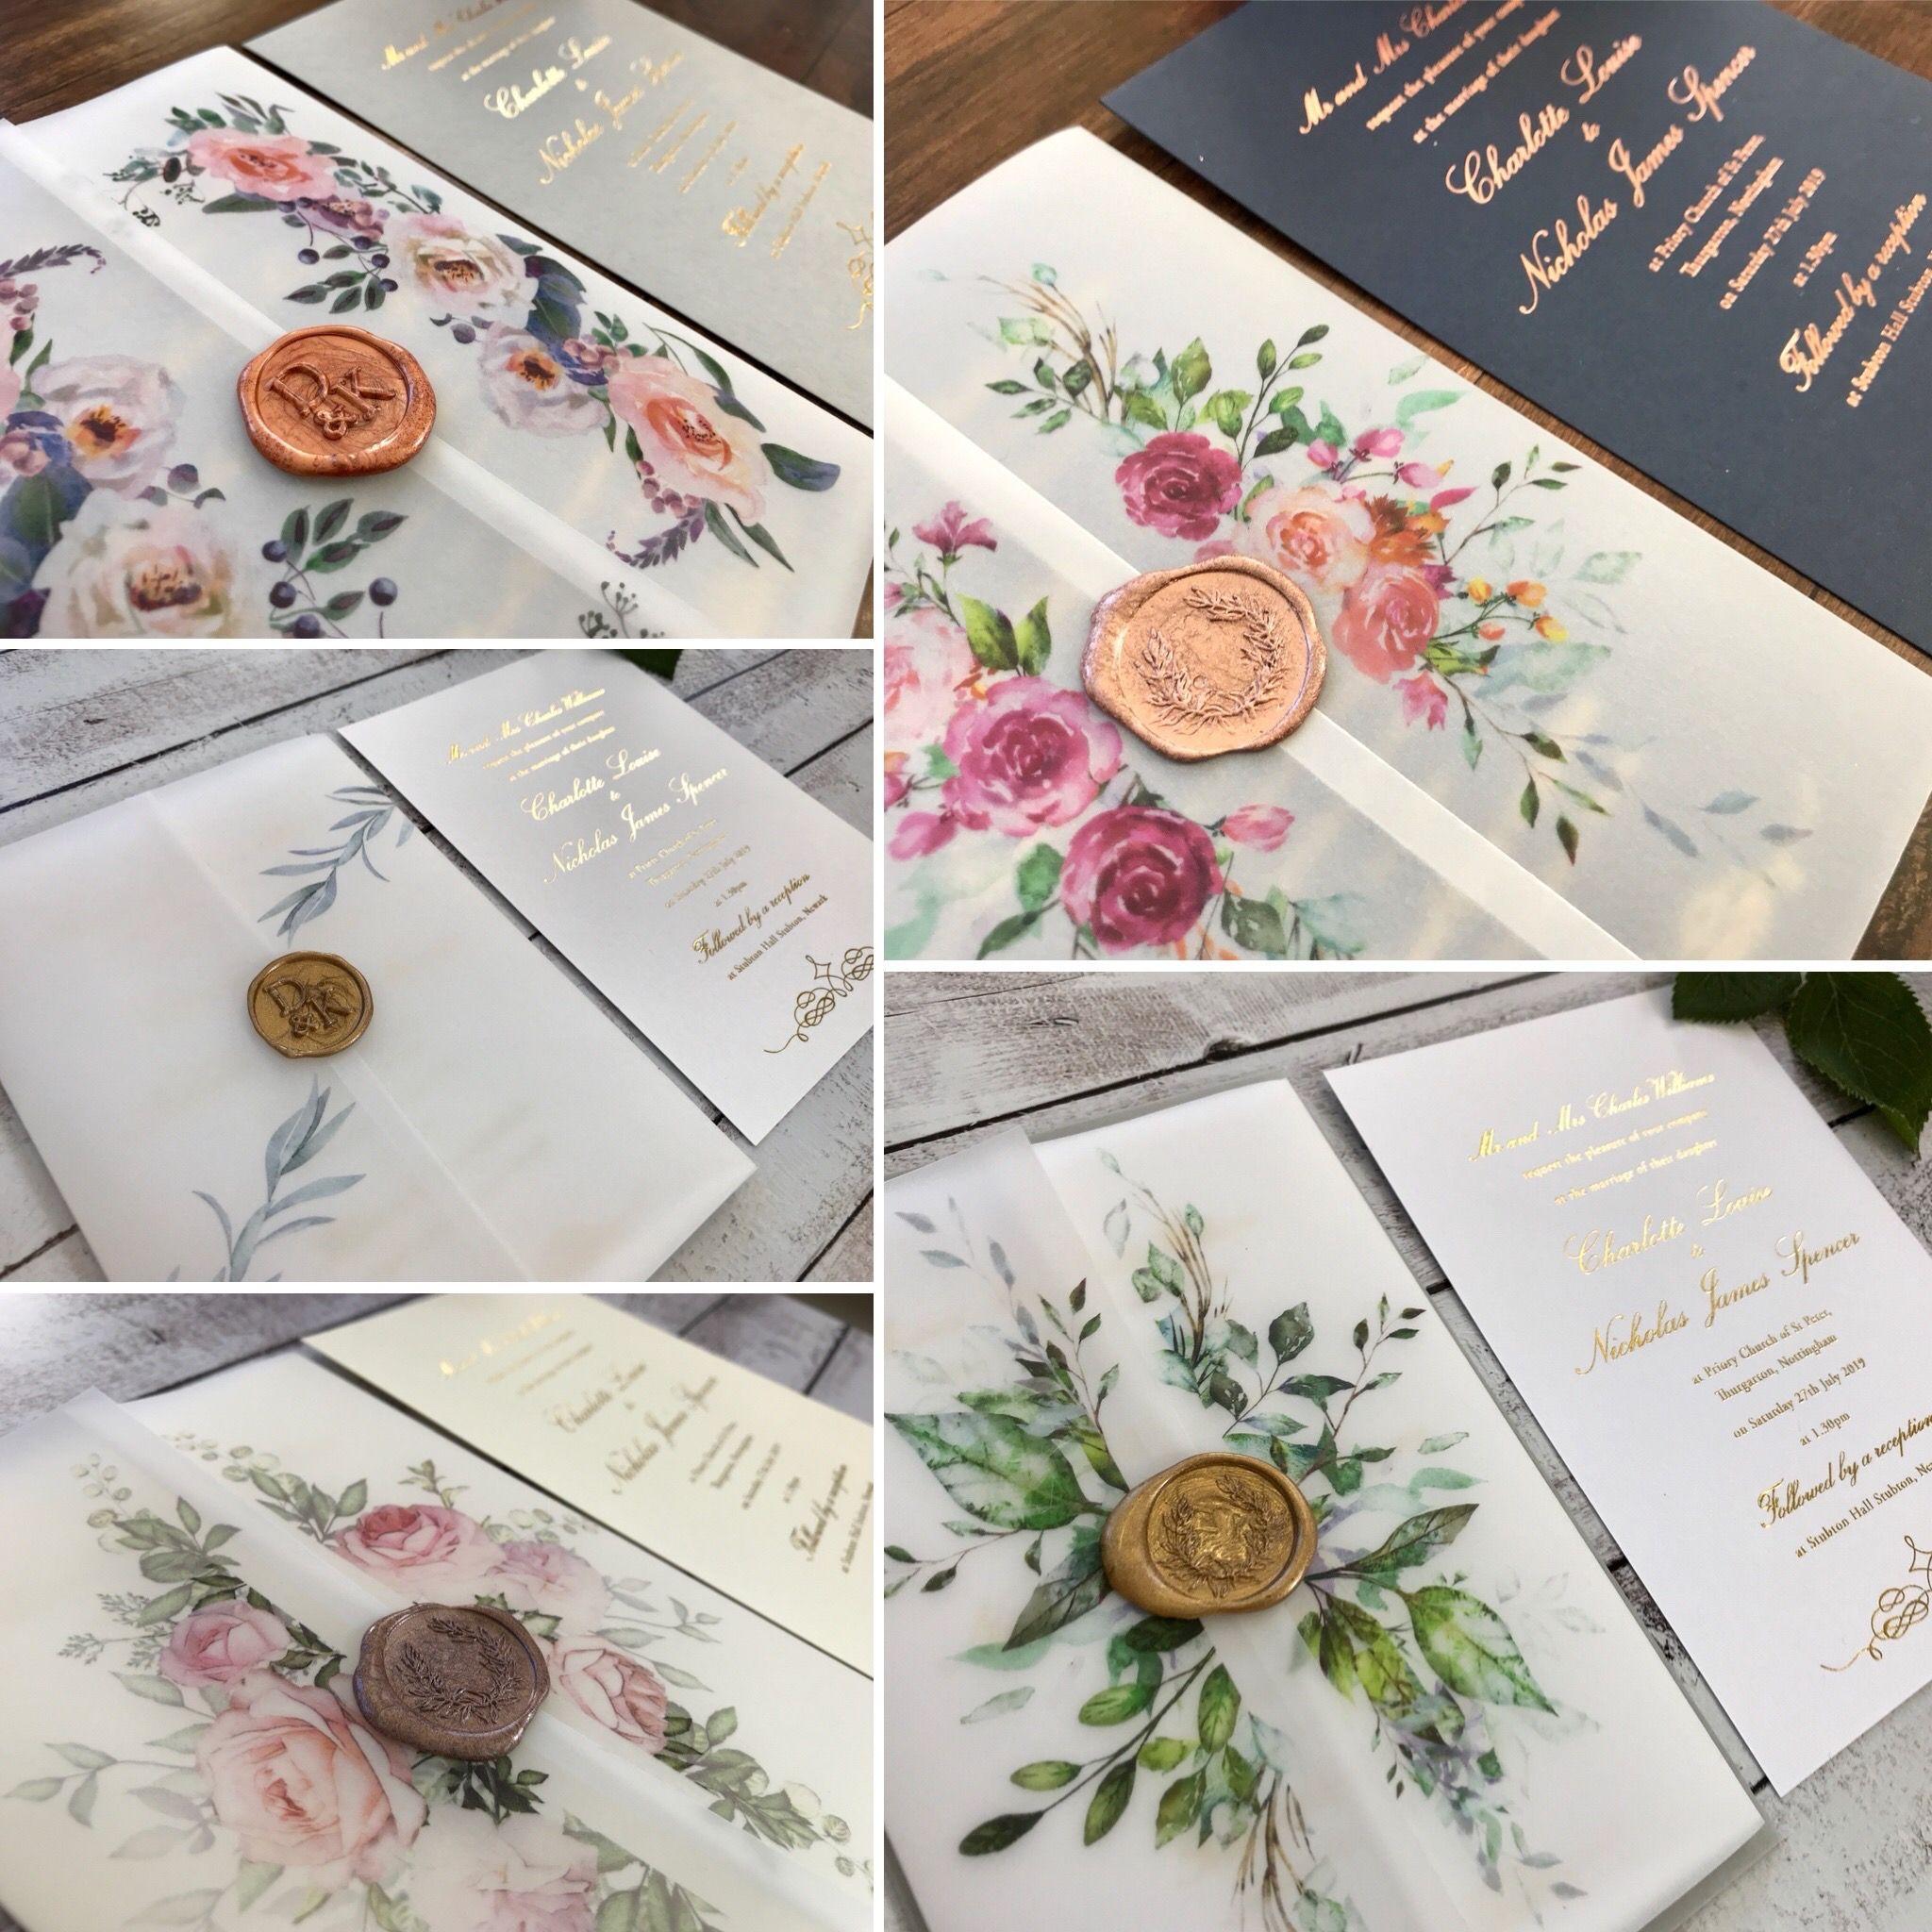 Wedding Invitations Eaton Wedding Stationery Wedding Invitation Cards Wedding Stationery Fun Wedding Invitations